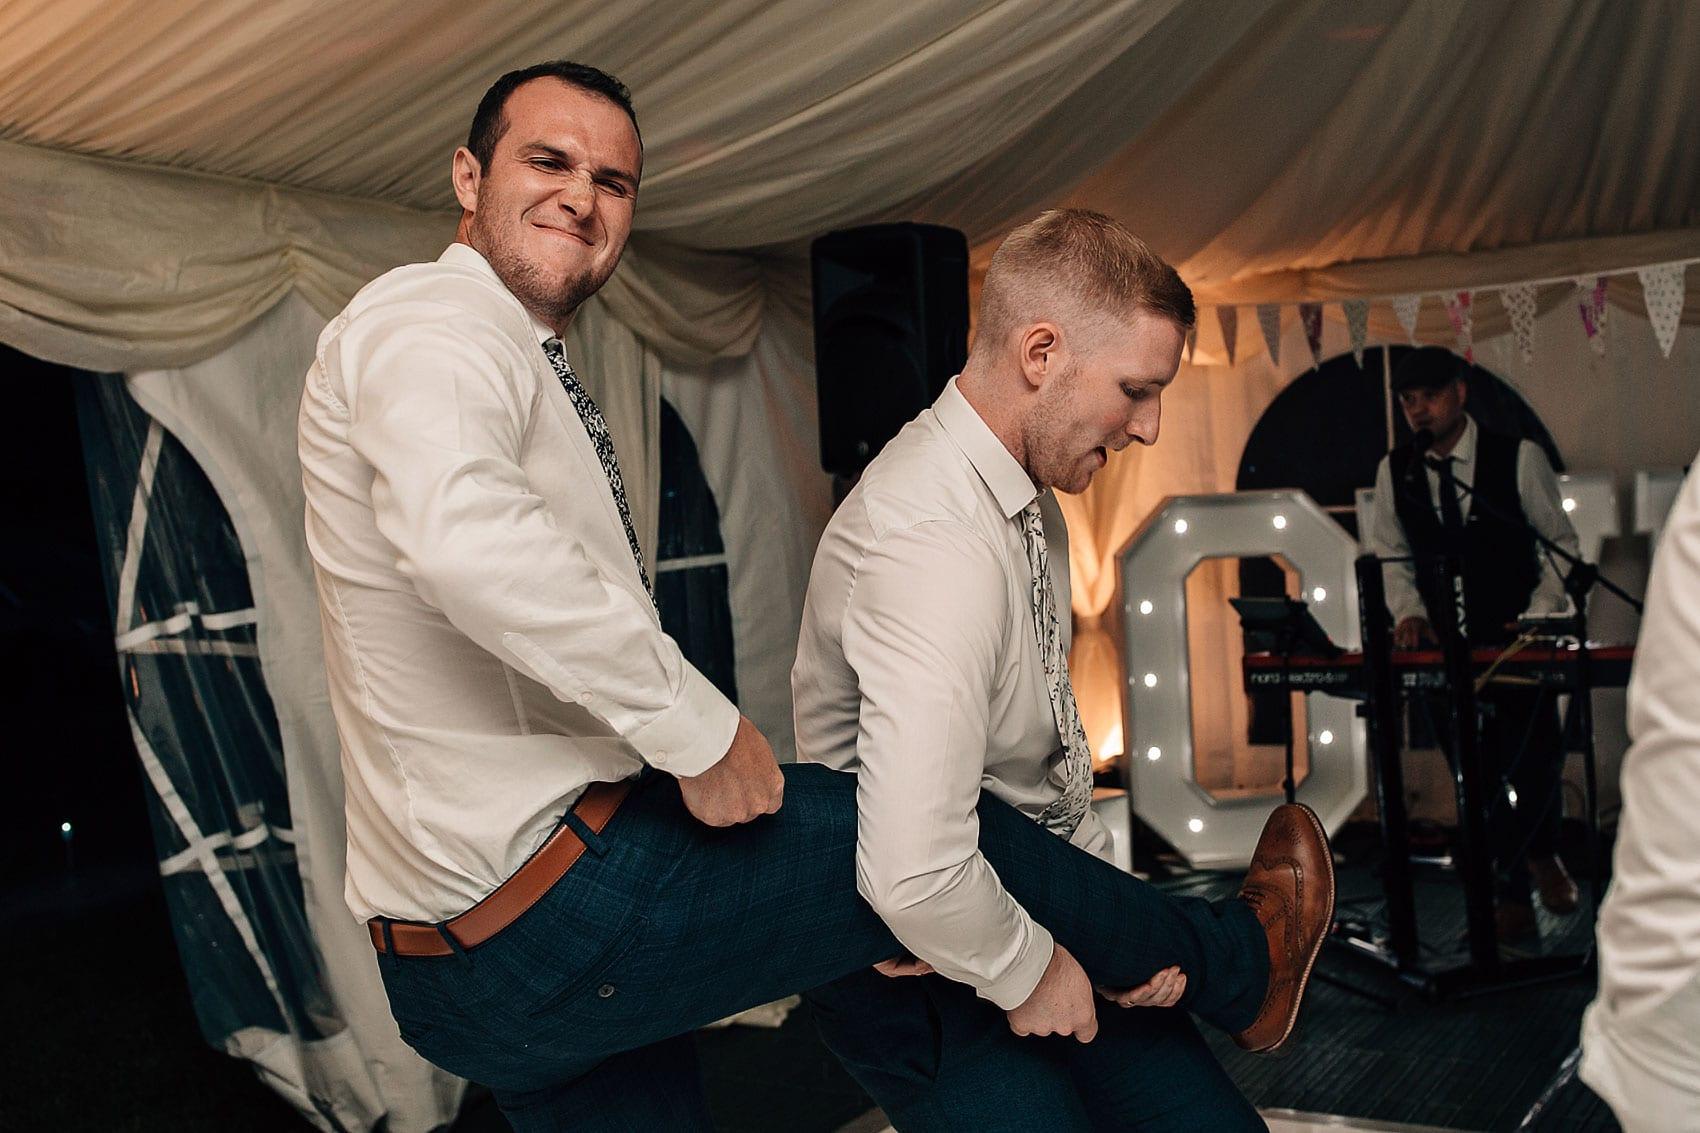 farm wedding dance-floor